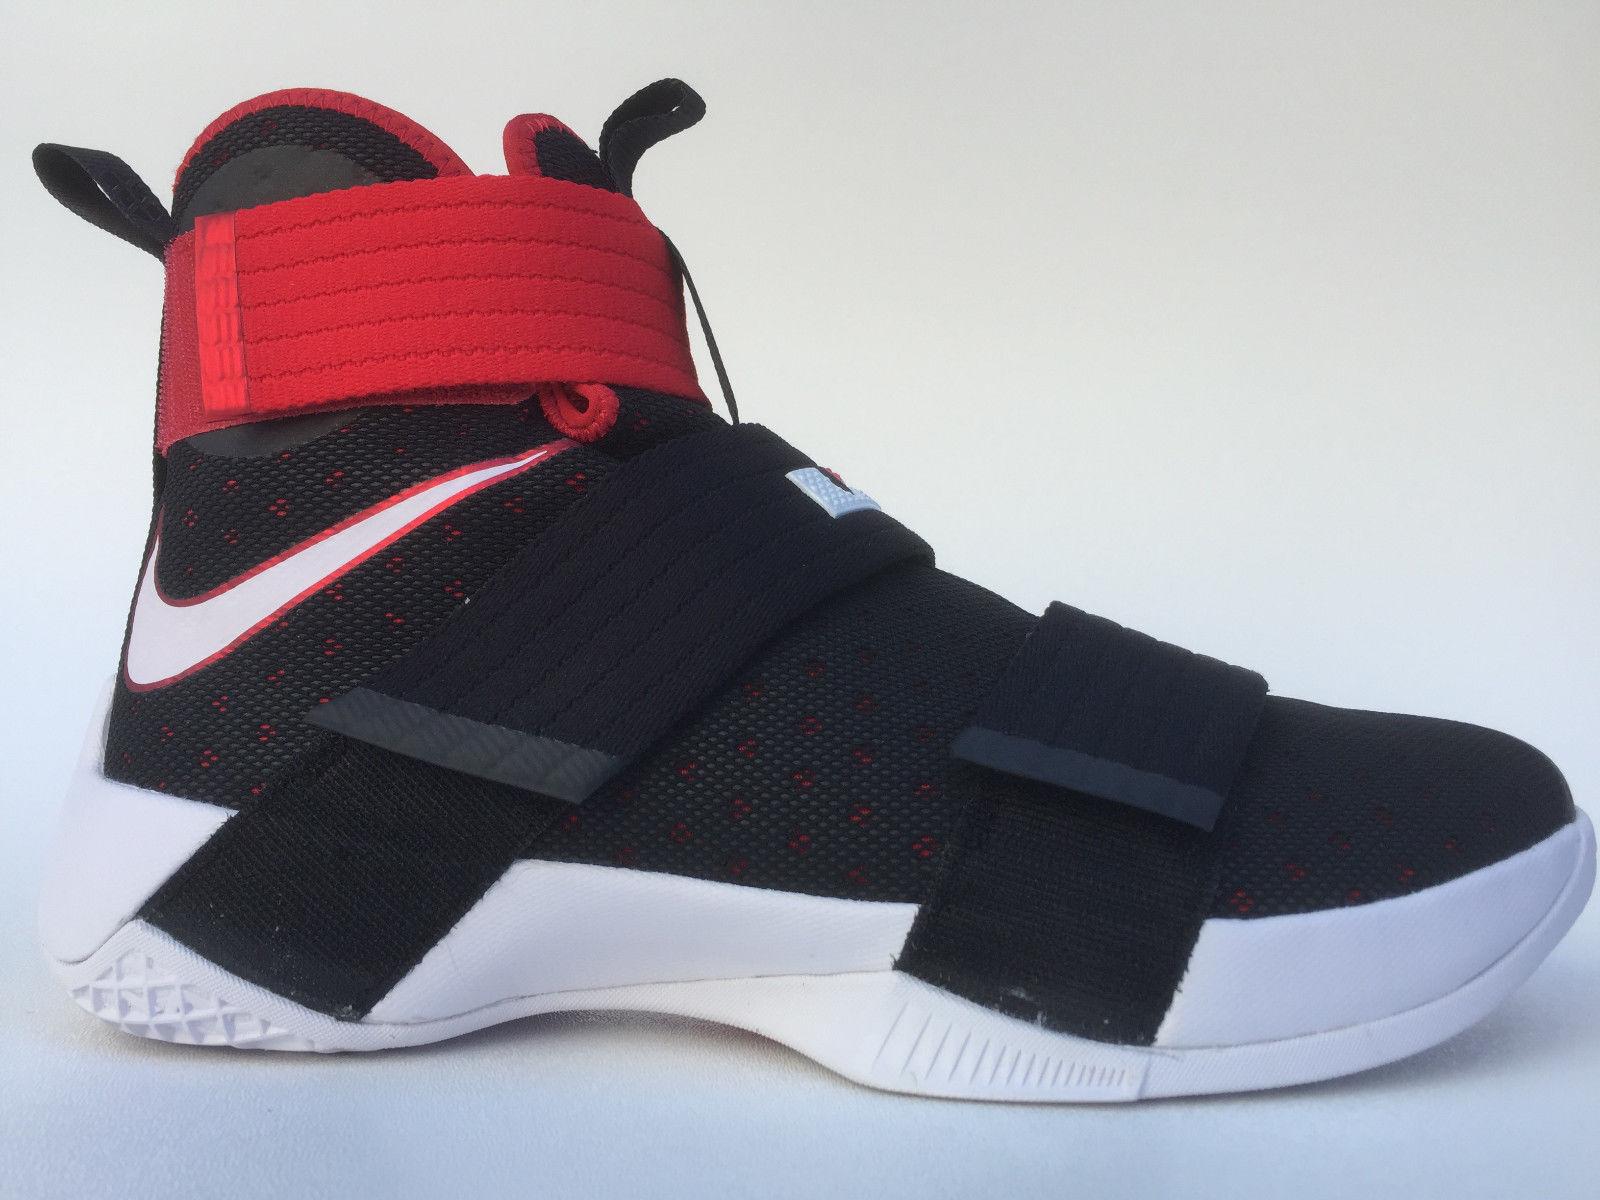 Mens Nike Lebron Soldier 10 844374 -016 Black/White Brand New Size 11